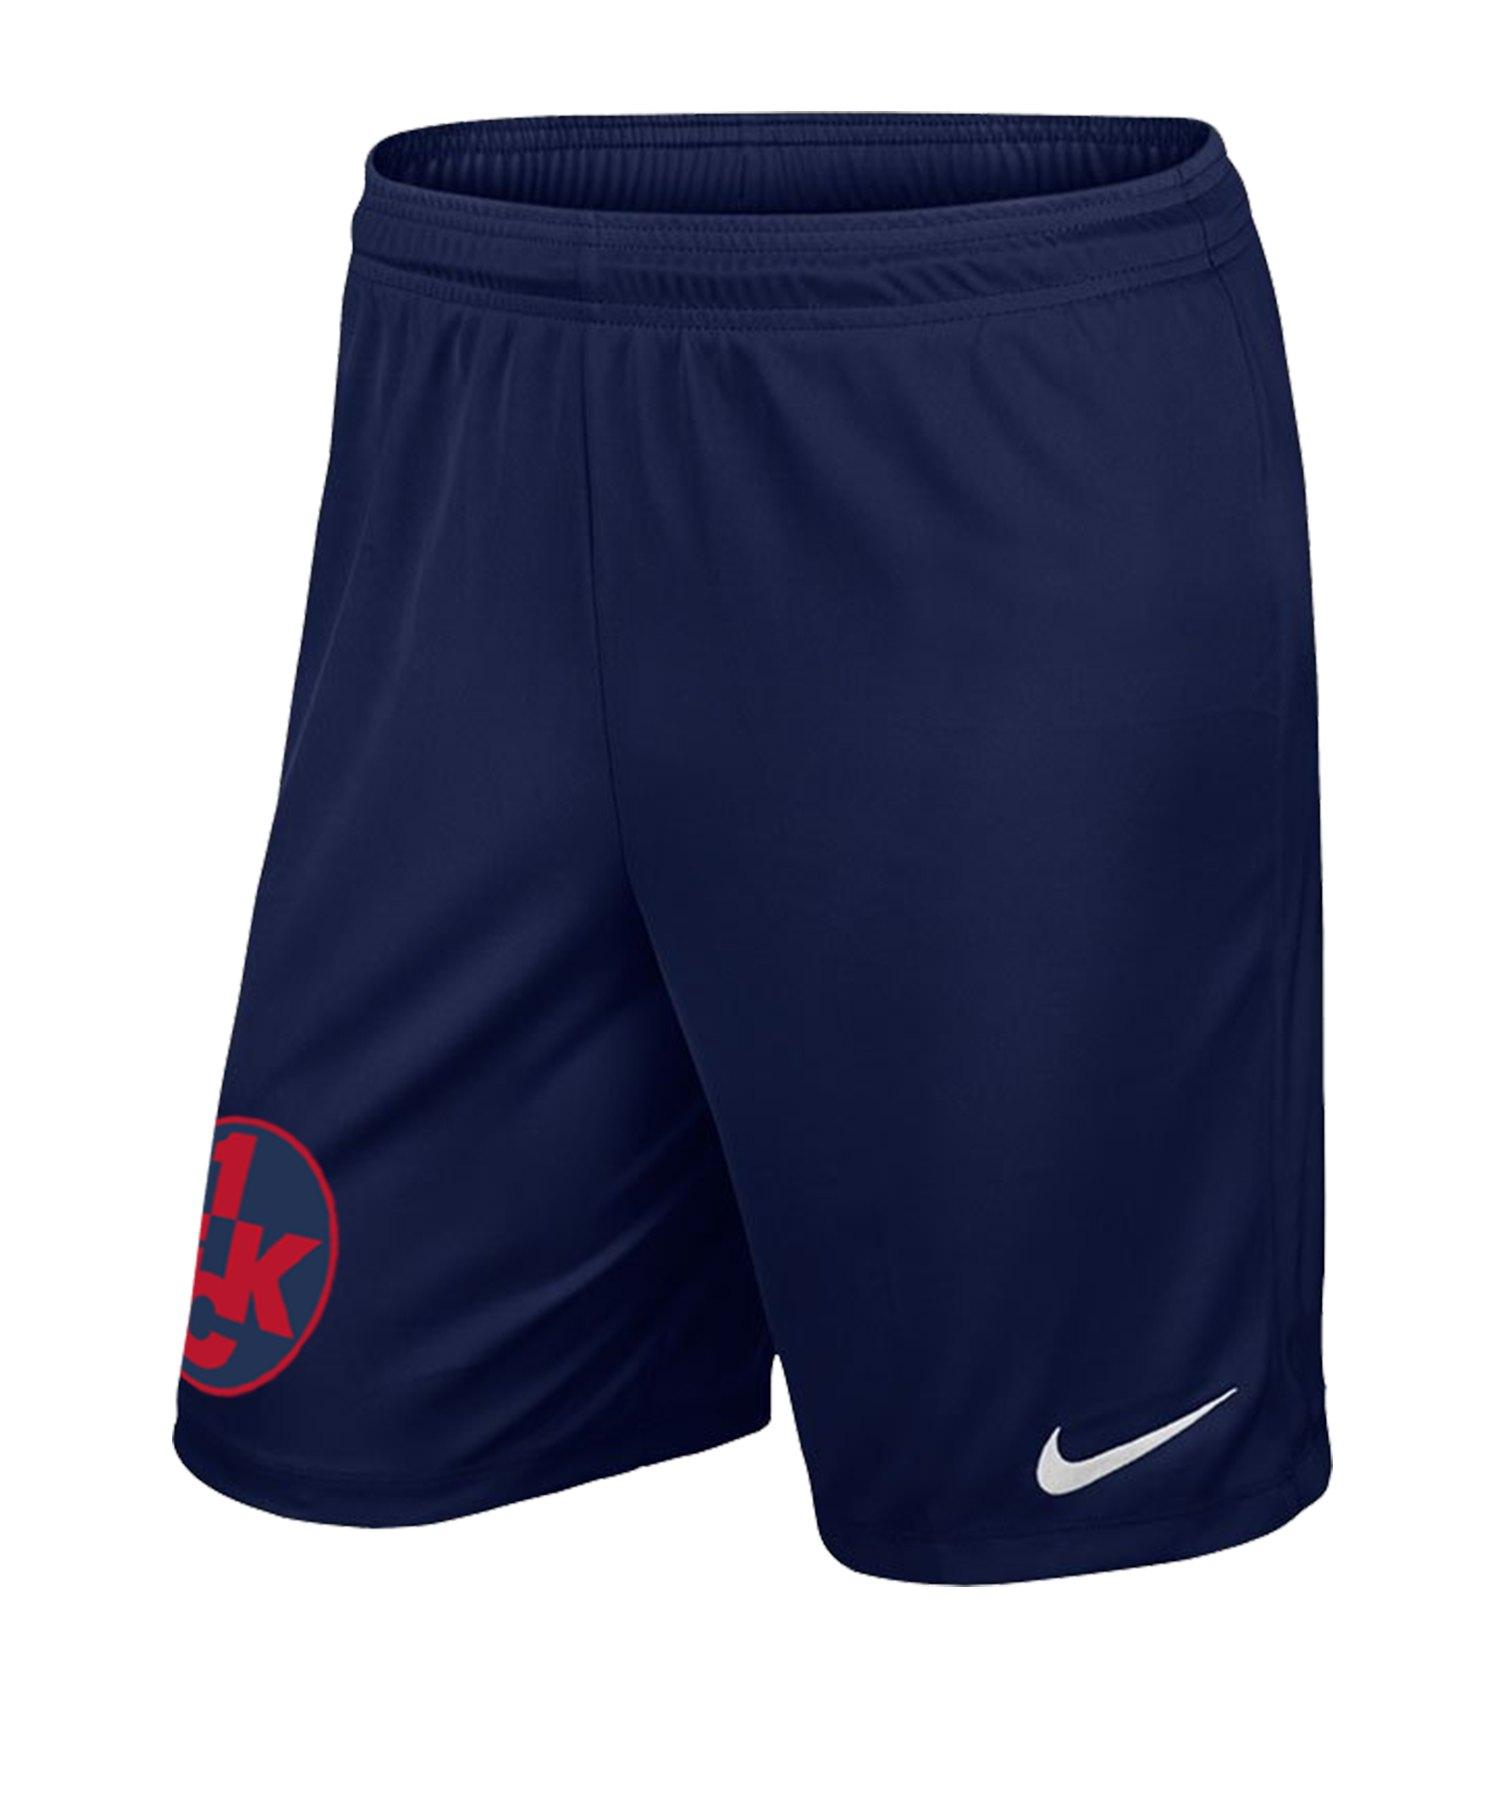 Nike 1. FC Kaiserslautern Short Away 19/20 F410 - blau